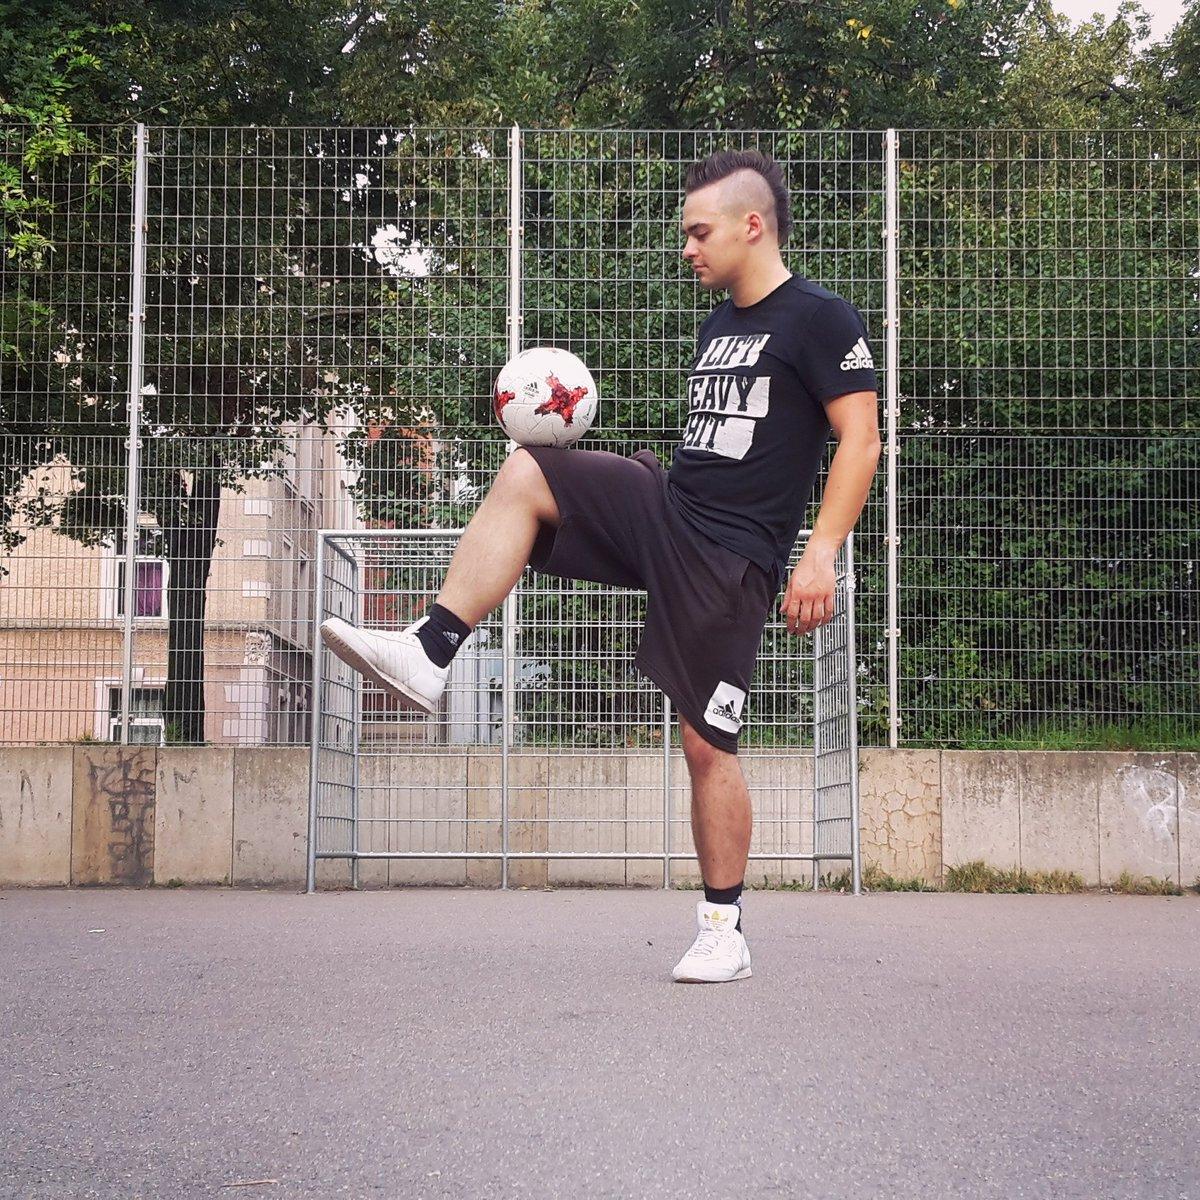 #Monday is #TrainingDay  always #HereToCreate  !! #NeverFollow #BeTheDifference #Adidas #Football #Fussball #Bolzplatz #Training #Skills<br>http://pic.twitter.com/9bWo37f0lF